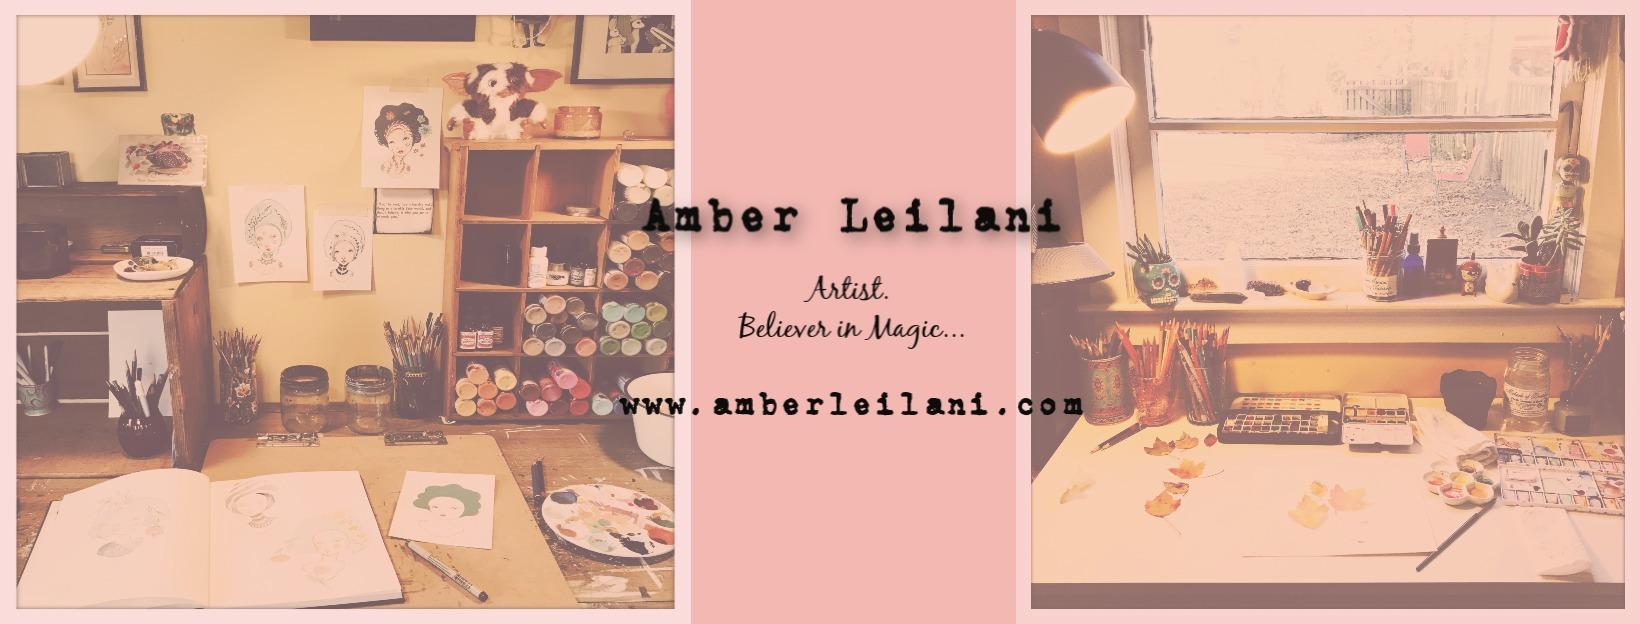 amber leilani middleton (@amberleilani) Cover Image